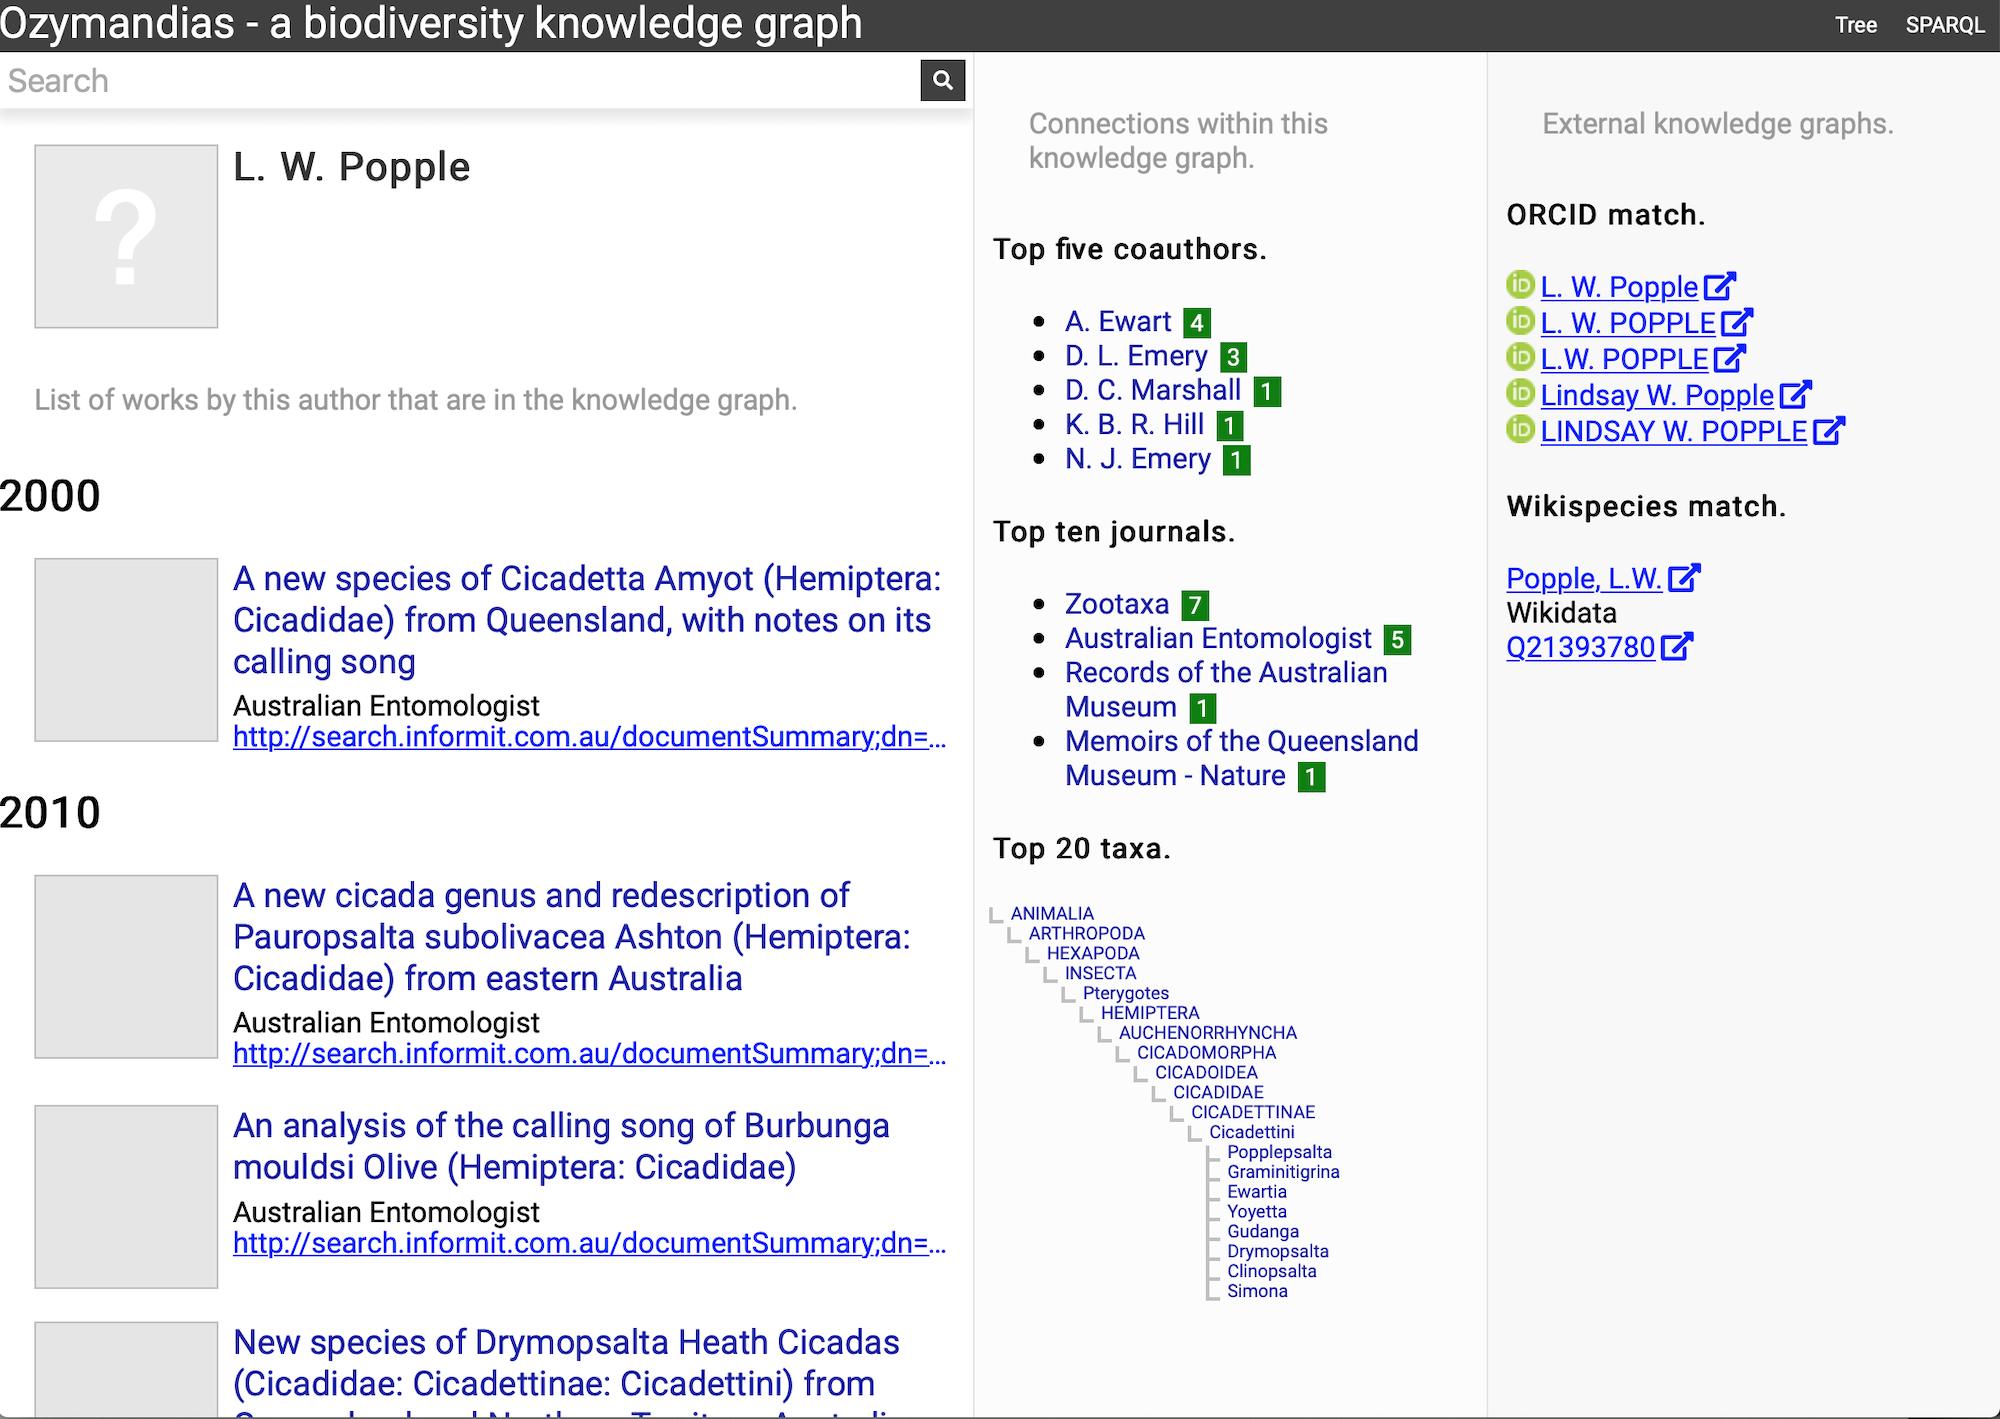 Ozymandias: a biodiversity knowledge graph [PeerJ]